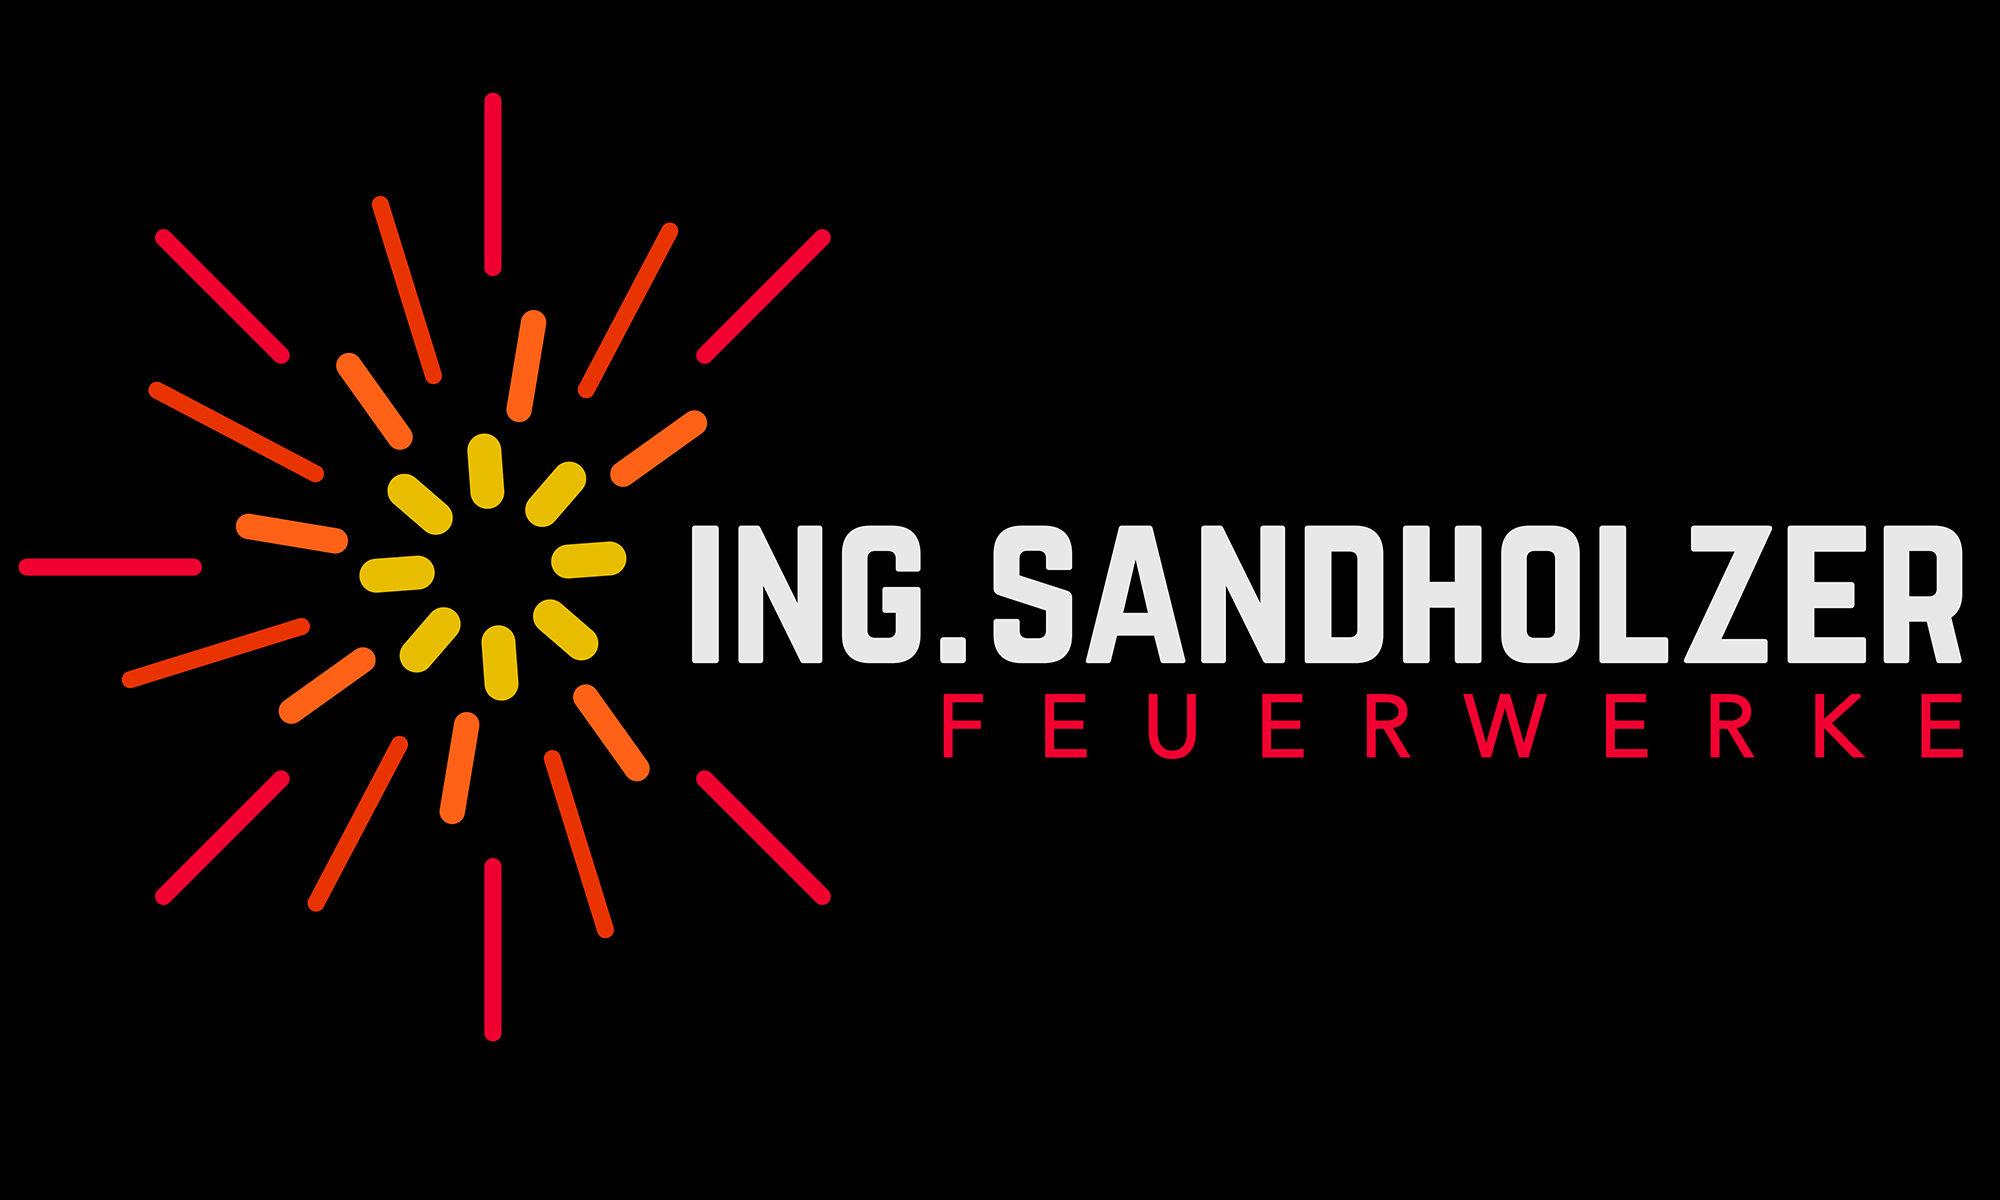 Ing. Markus Sandholzer Feuerwerke